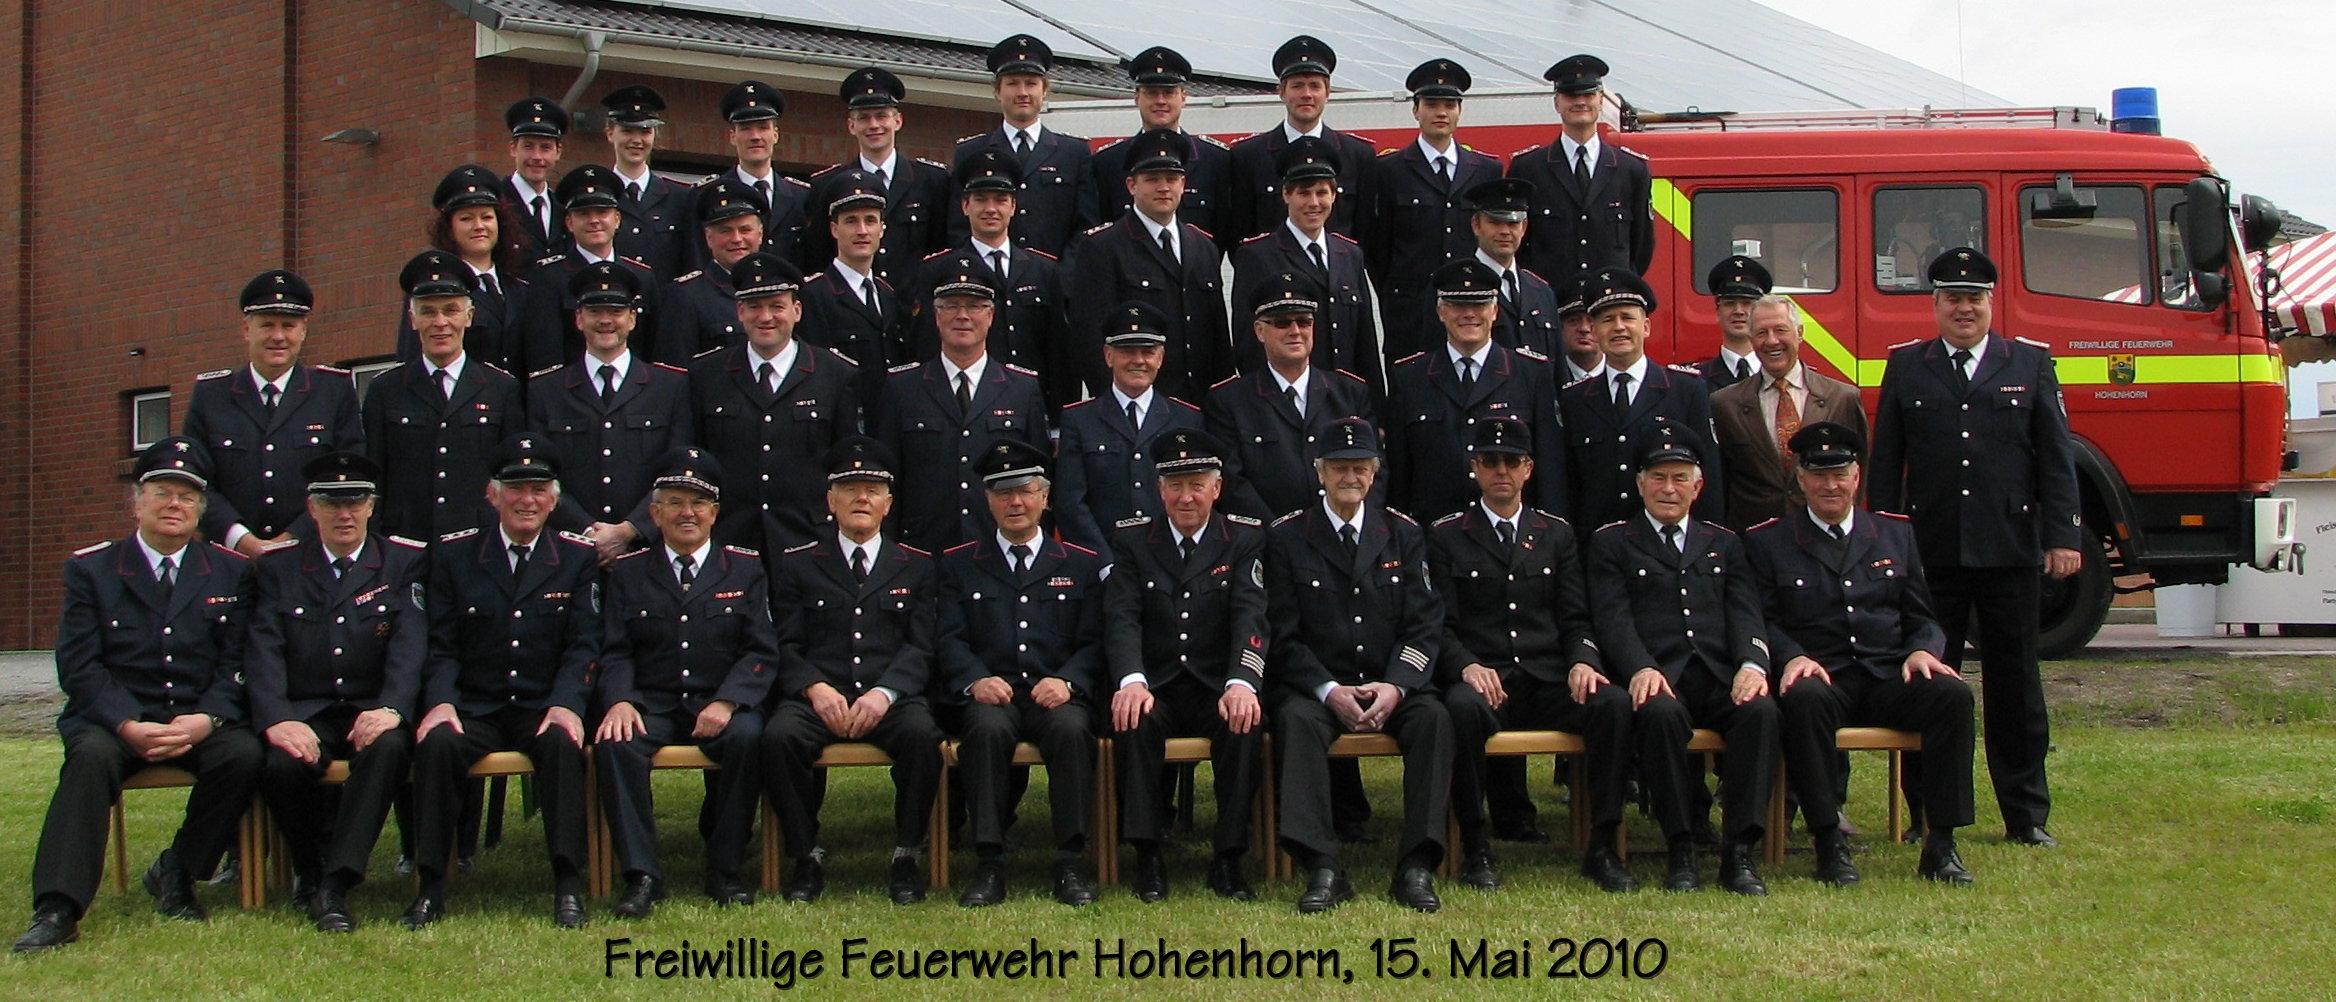 FFW Hohenhorn-Gruppenbild-15.05.2010